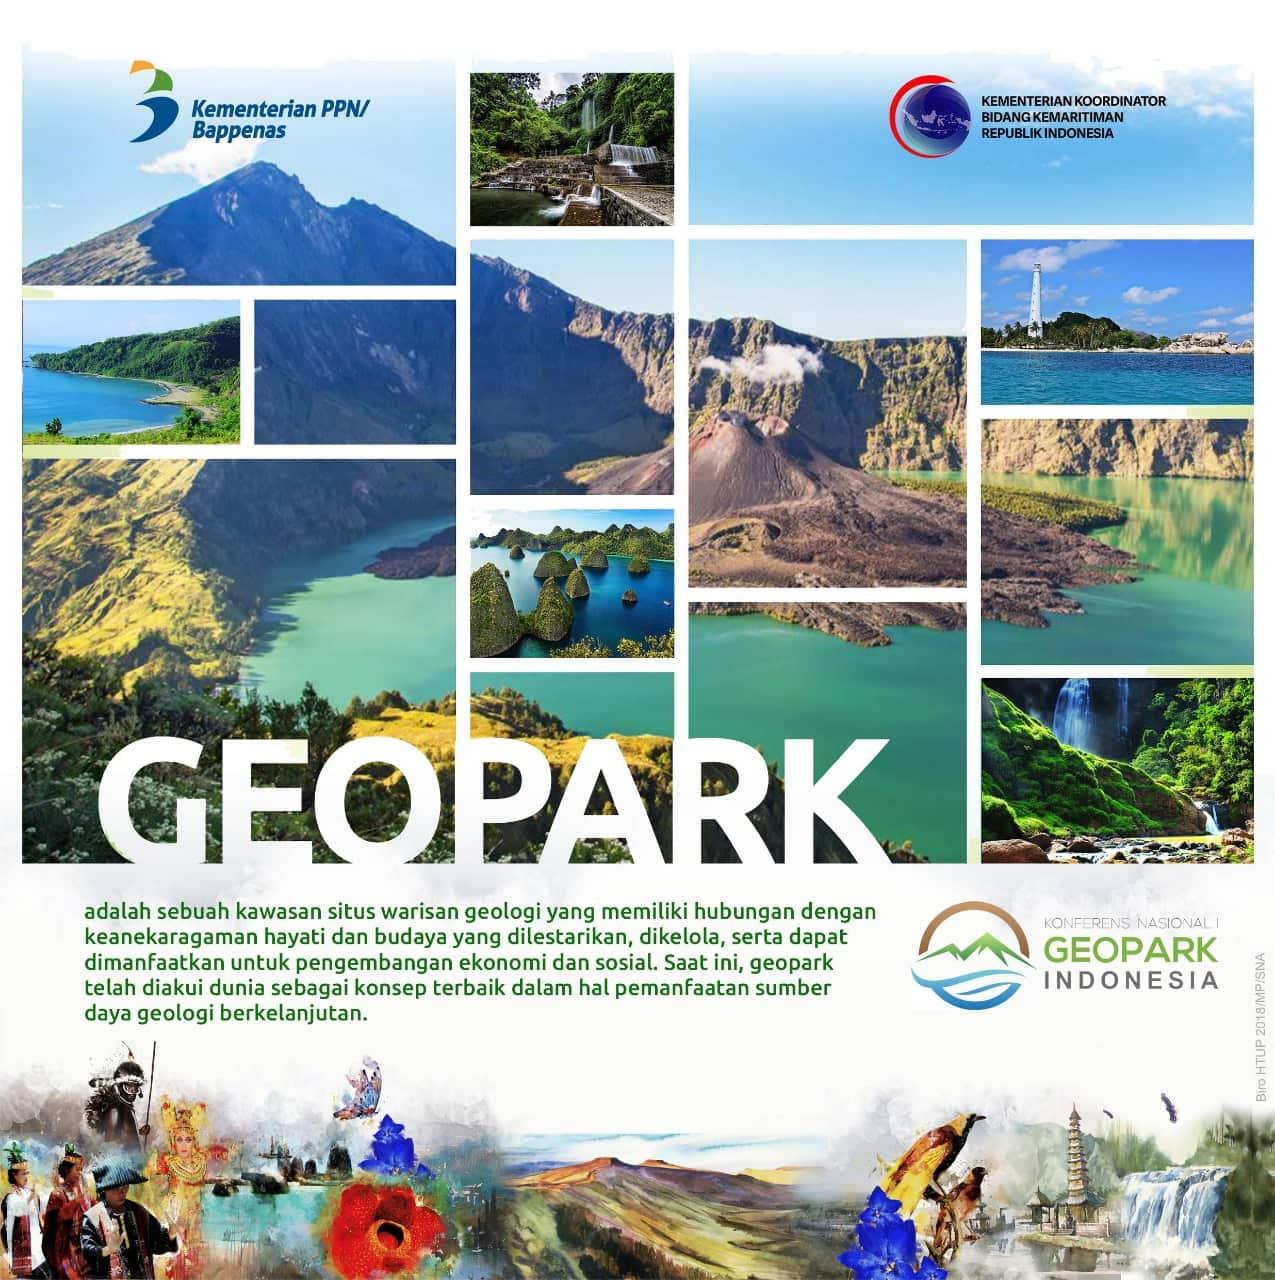 Geopark Indonesia Mendunia: Implementasi Sustainable Development Goals melalui Pengembangan Geopark